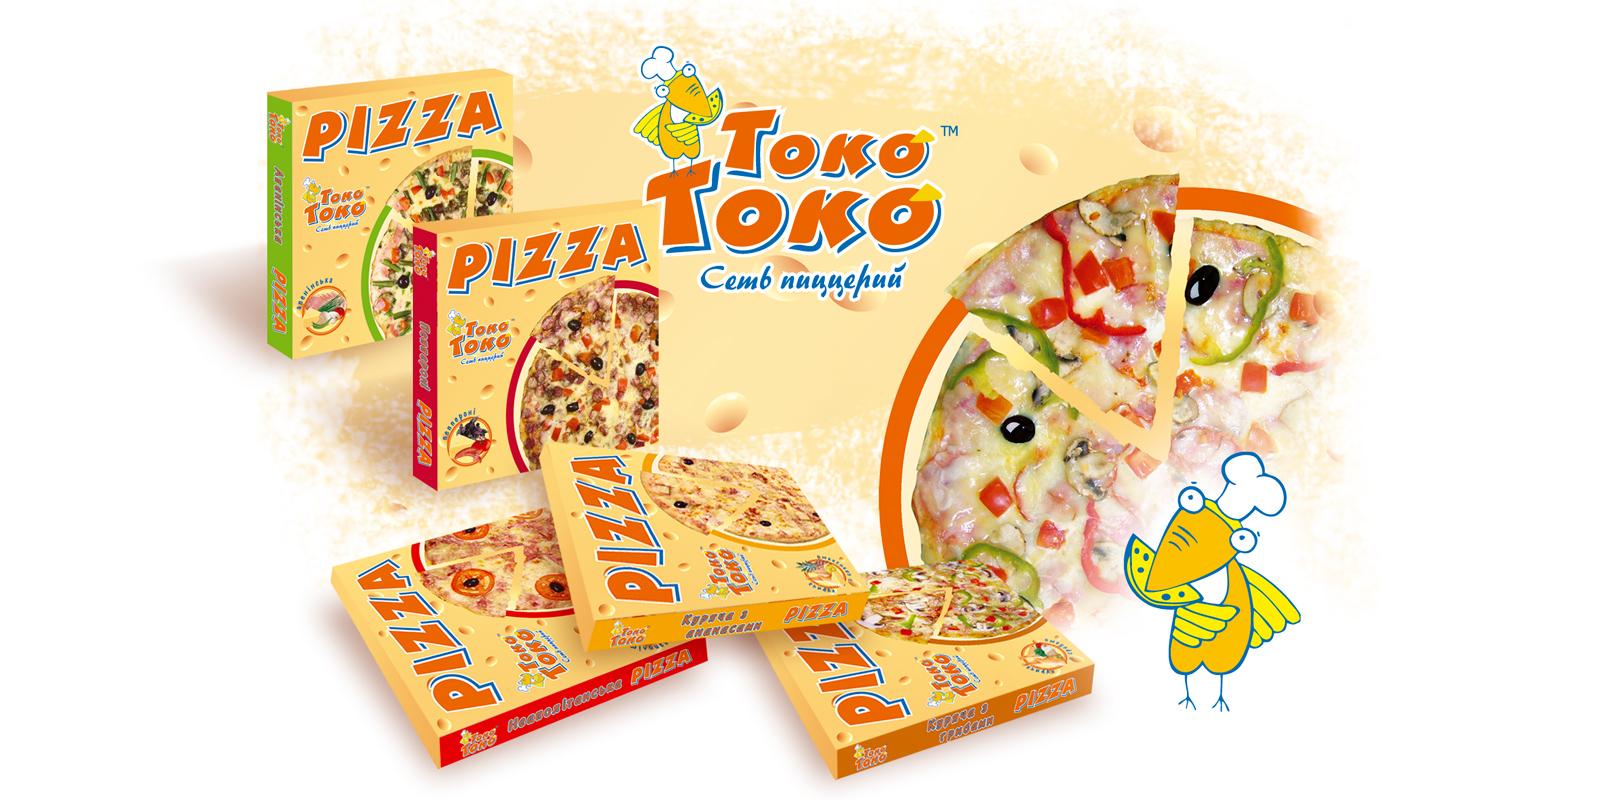 Сеть пиццерий «Токо Токо»;;;;;;Разработка упаковки (пицца);;;;;;<span>Клиент:</span> Сеть пиццерий «Токо Токо»;;;;;;;;;;;;Разработка упаковки (пицца);;;;;; 2 ;;;;;;